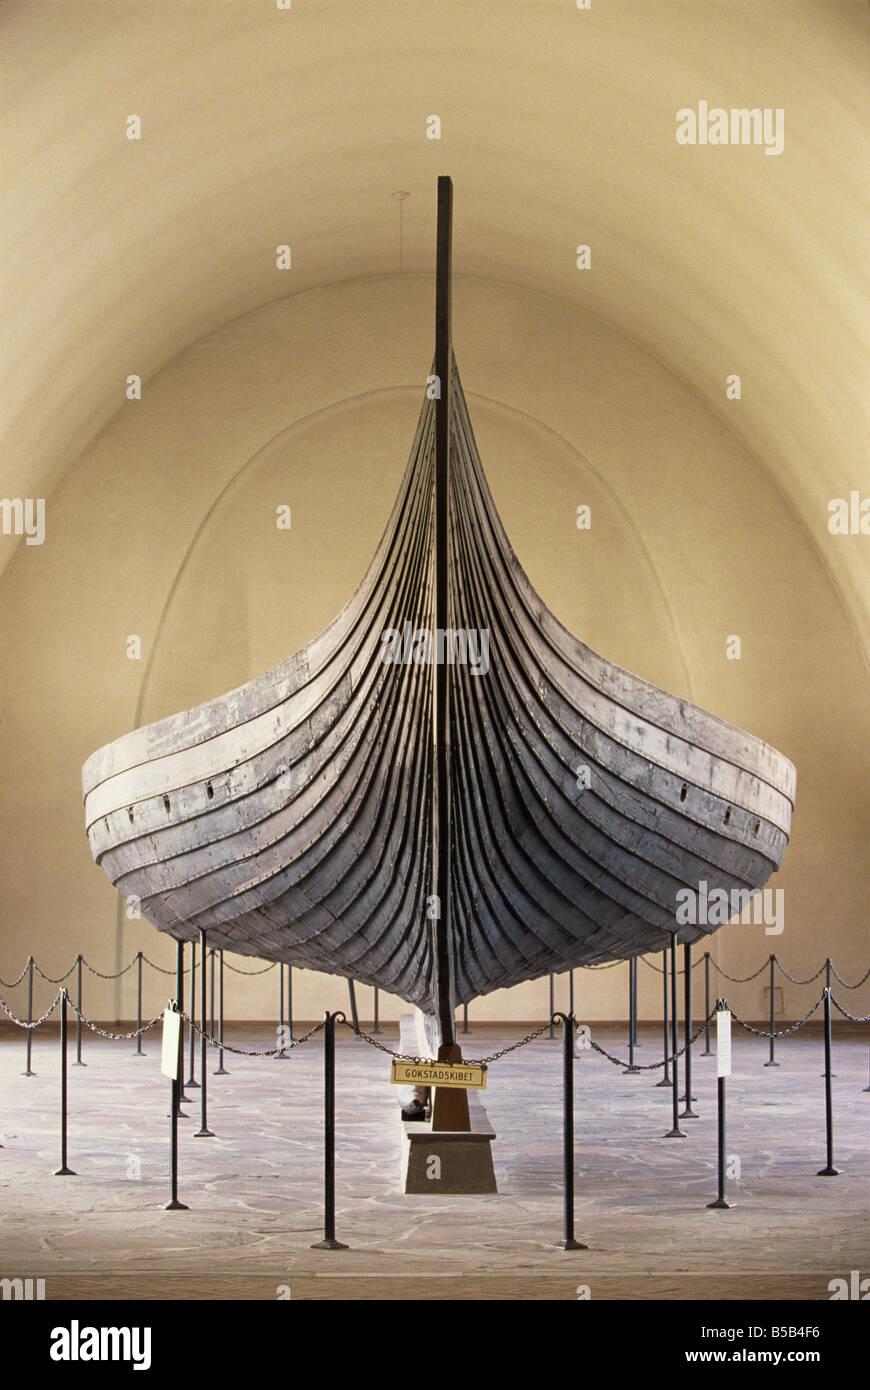 Gokstad Ship, Viking Ship Museum, Bygdoy, Oslo, Norway, Scandinavia, Europe - Stock Image